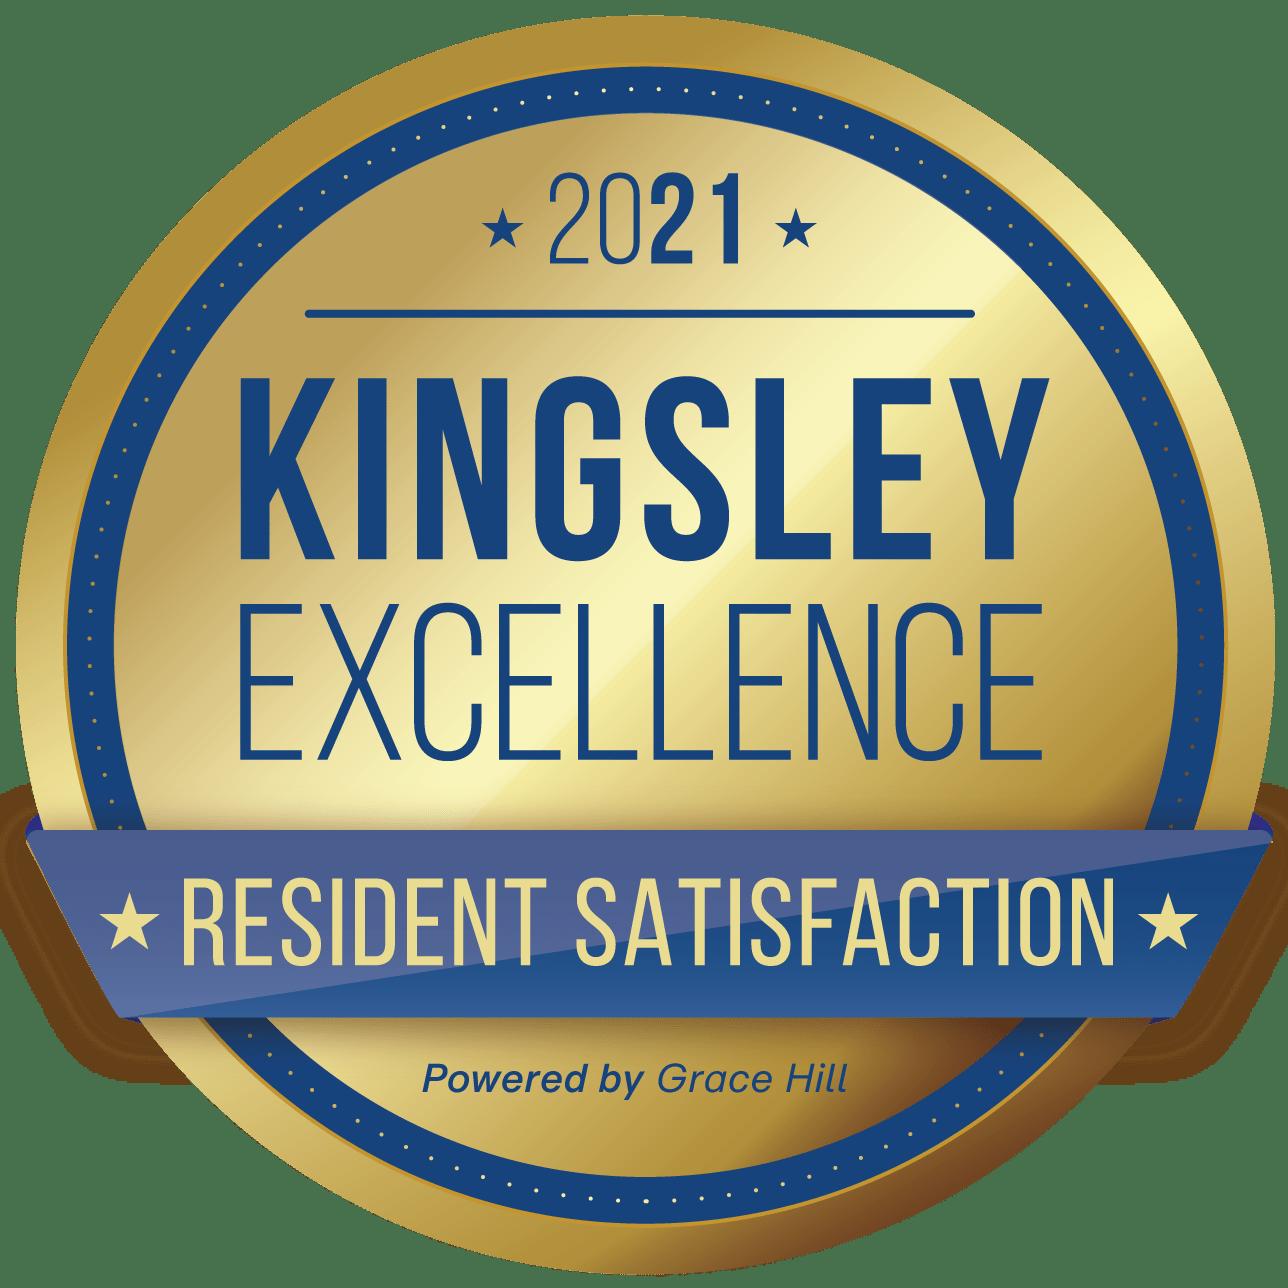 kingsley excellence award logo